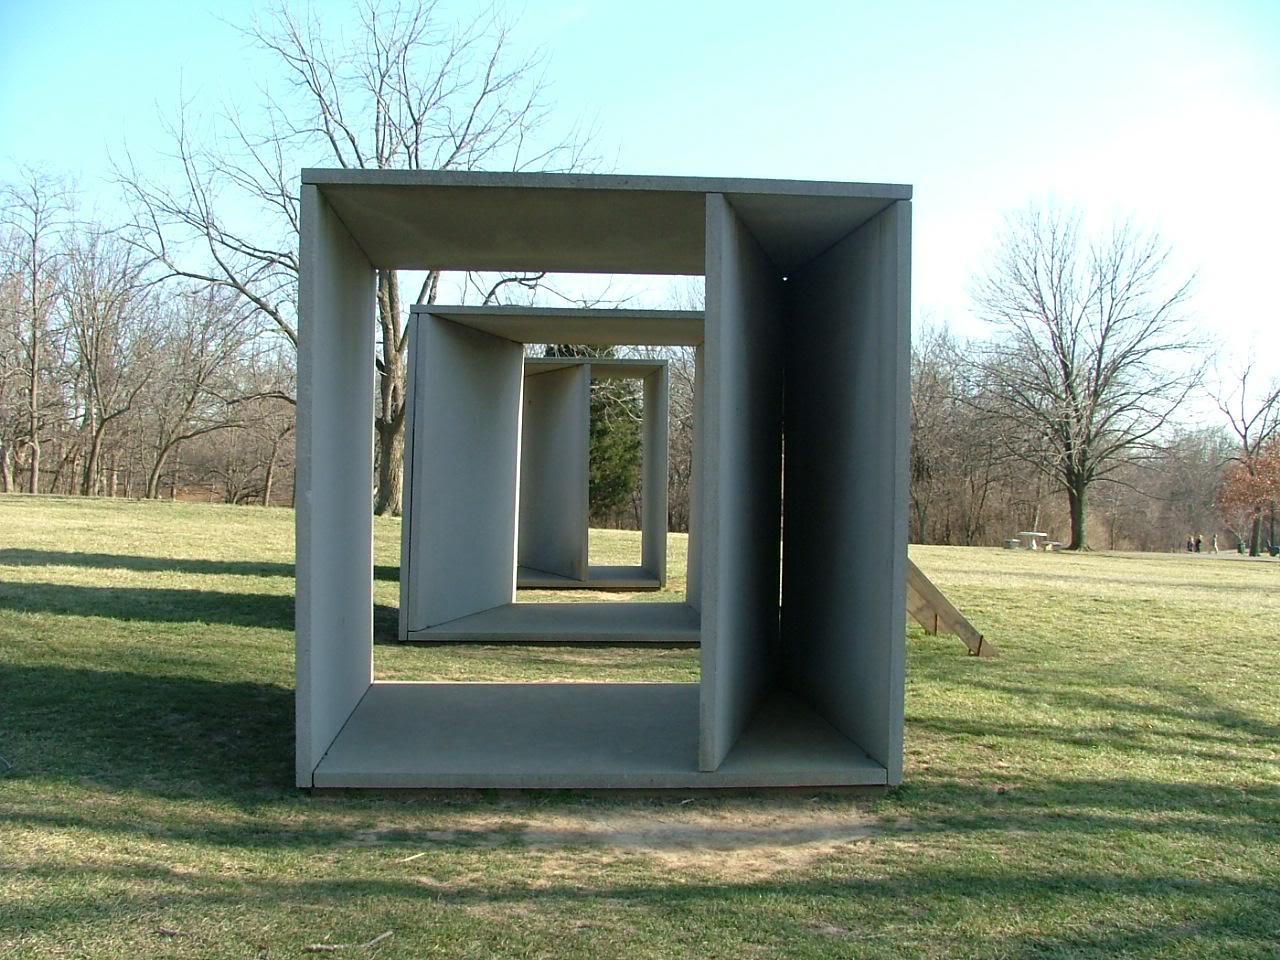 Unspoken cinema minimalisme postmodernit et arte povera for Architecture minimaliste